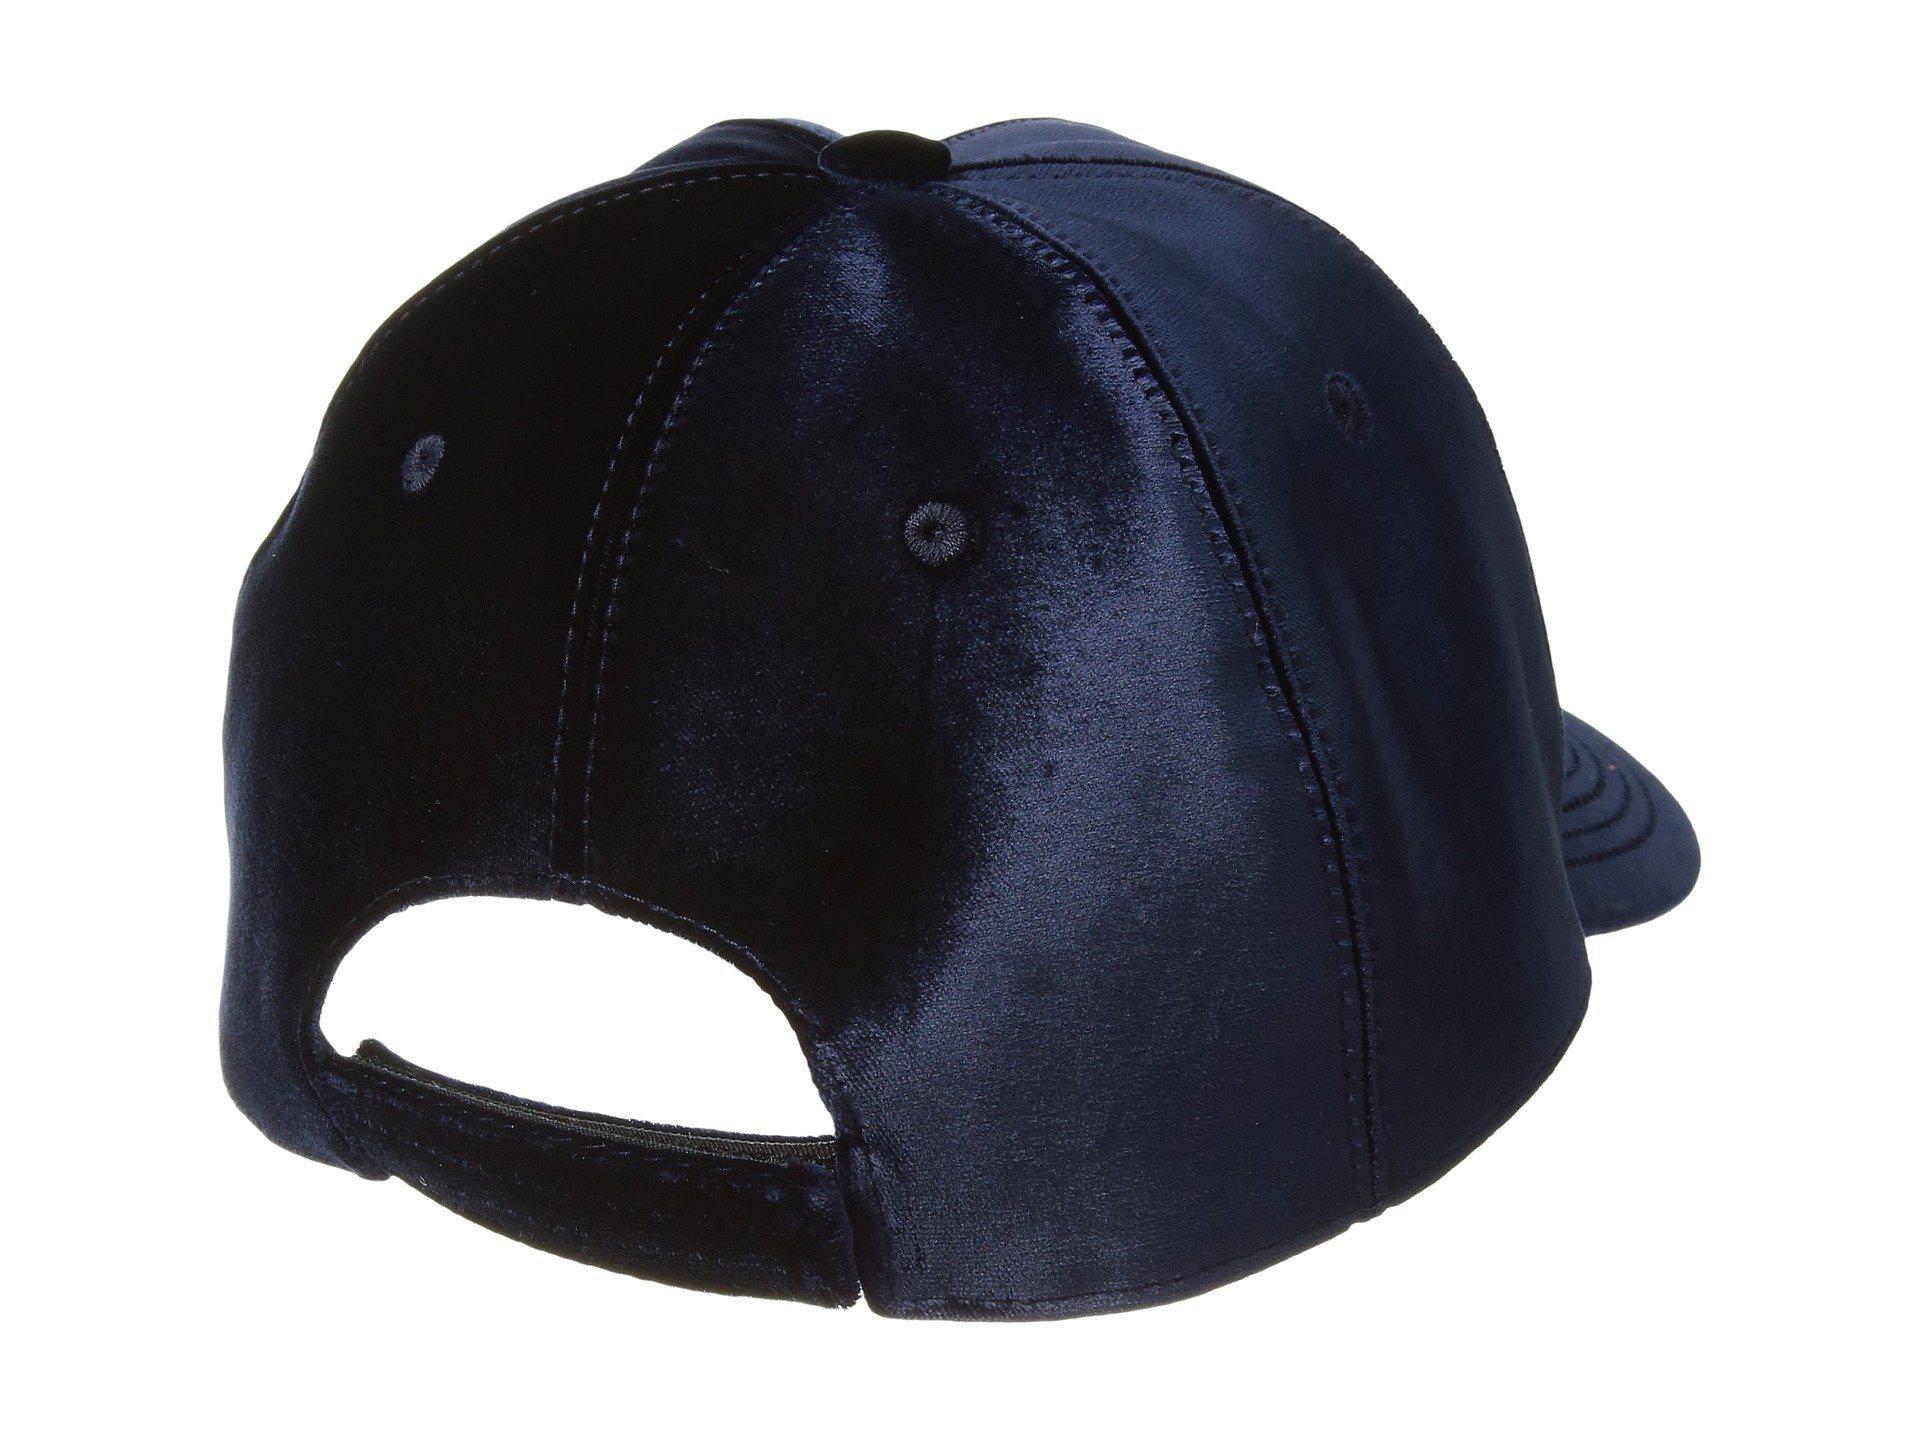 b562a1f2616 Lyst - Versace Velvet Crown Cap in Blue for Men